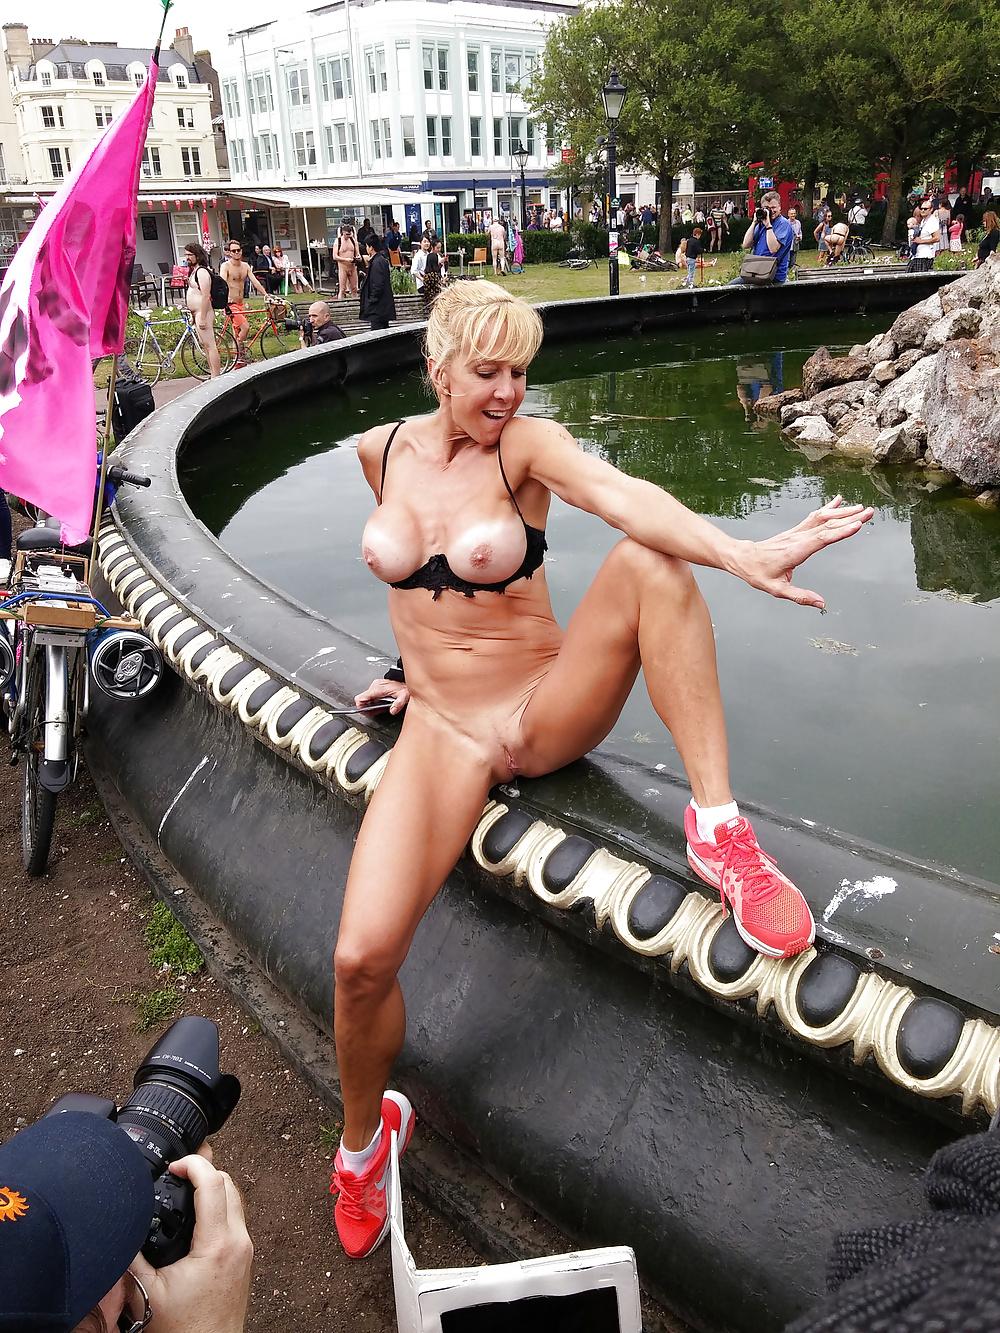 rubin-assaulted-ebonnyporn-at-public-photos-nude